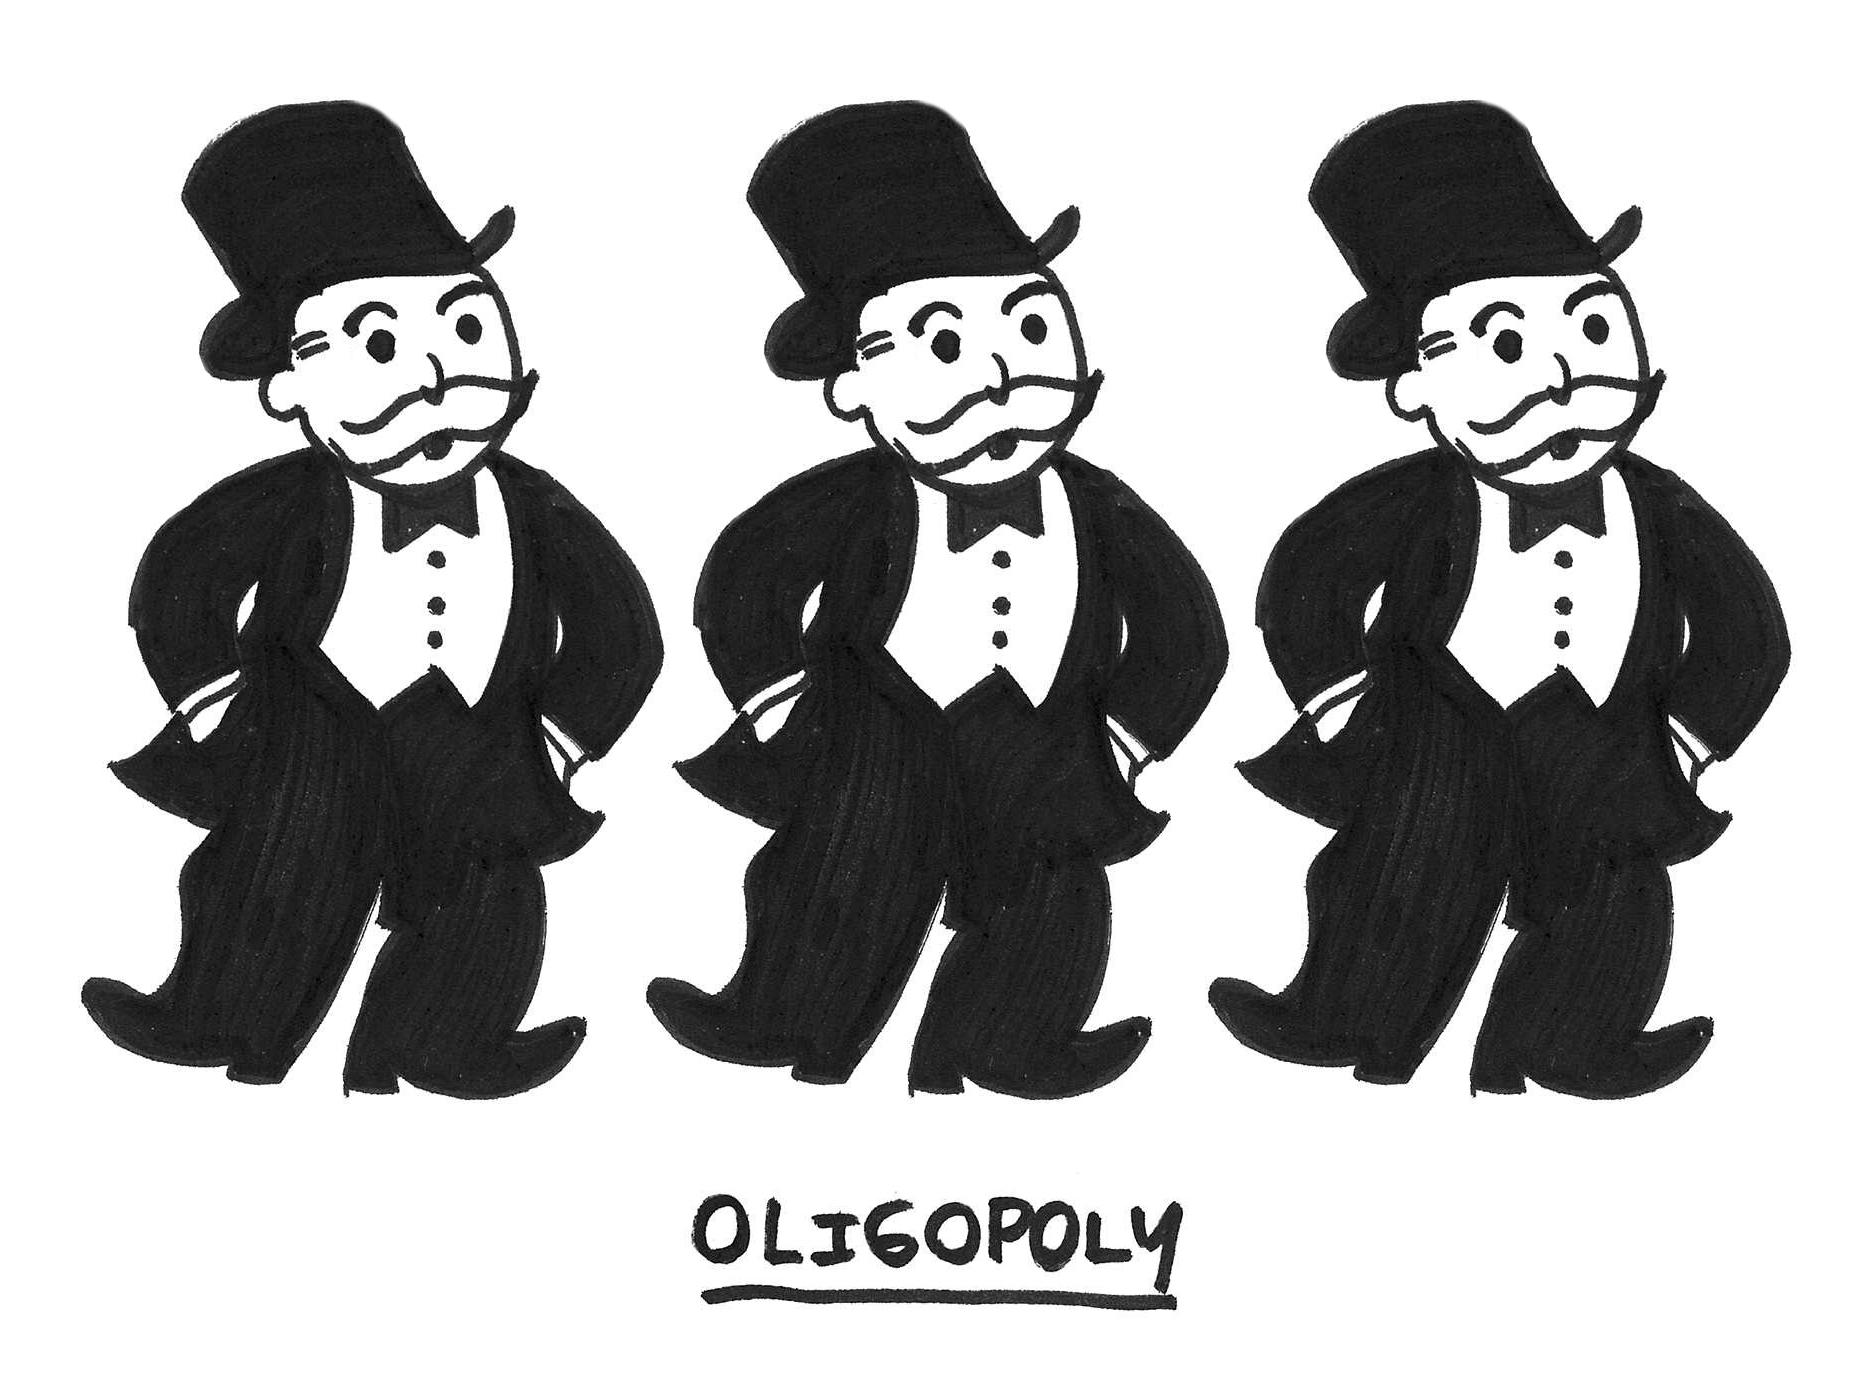 05_2_oligopoly.jpg